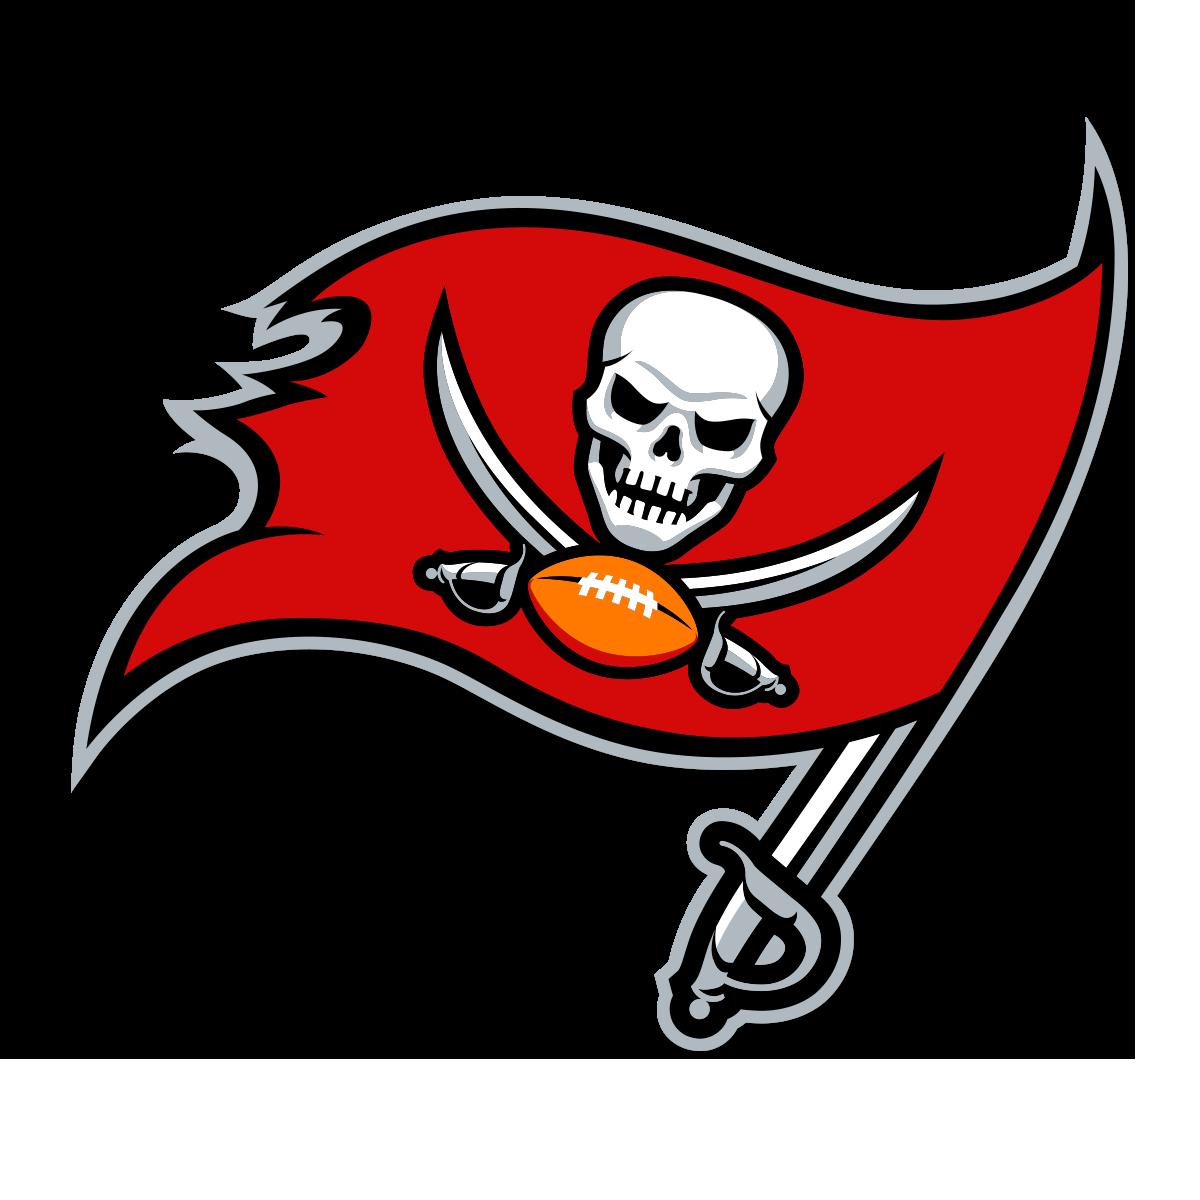 Kickin It With Connor Barth Tampa Bay Buccaneers Logo Tampa Bay Buccaneers Tampa Bay Buccaneers Football